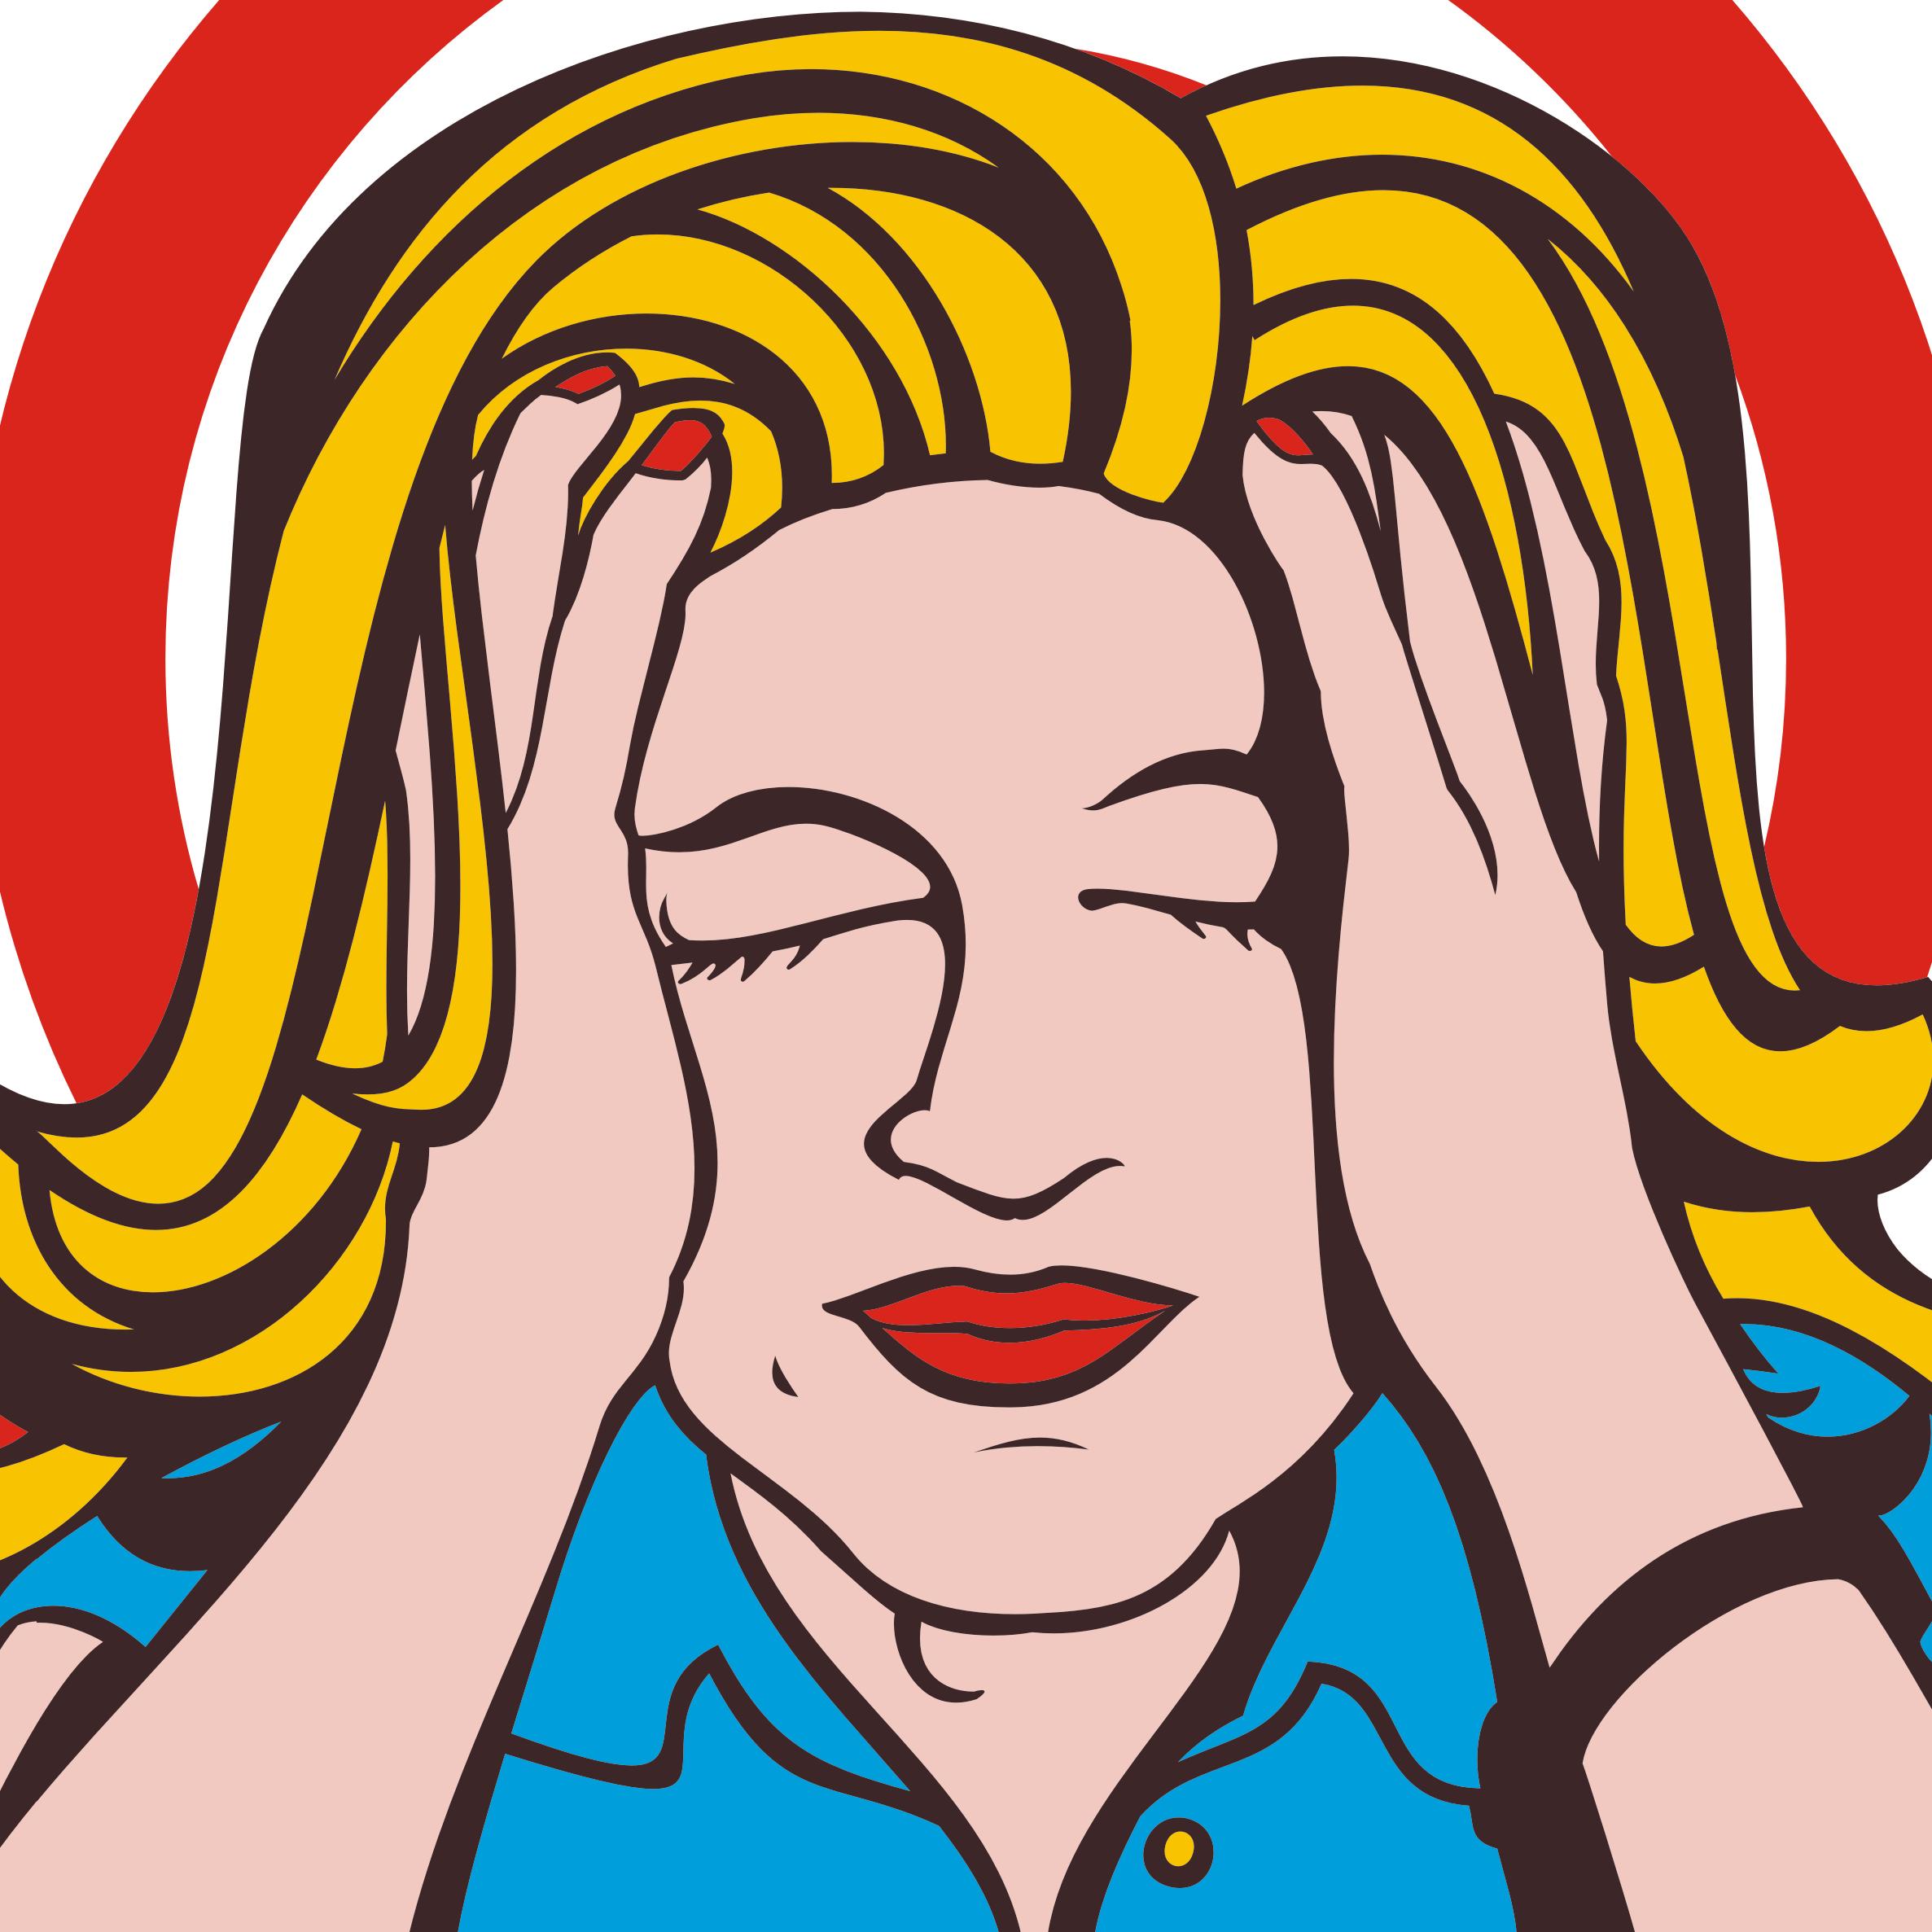 Free Stress Cliparts, Download Free Clip Art, Free Clip Art.